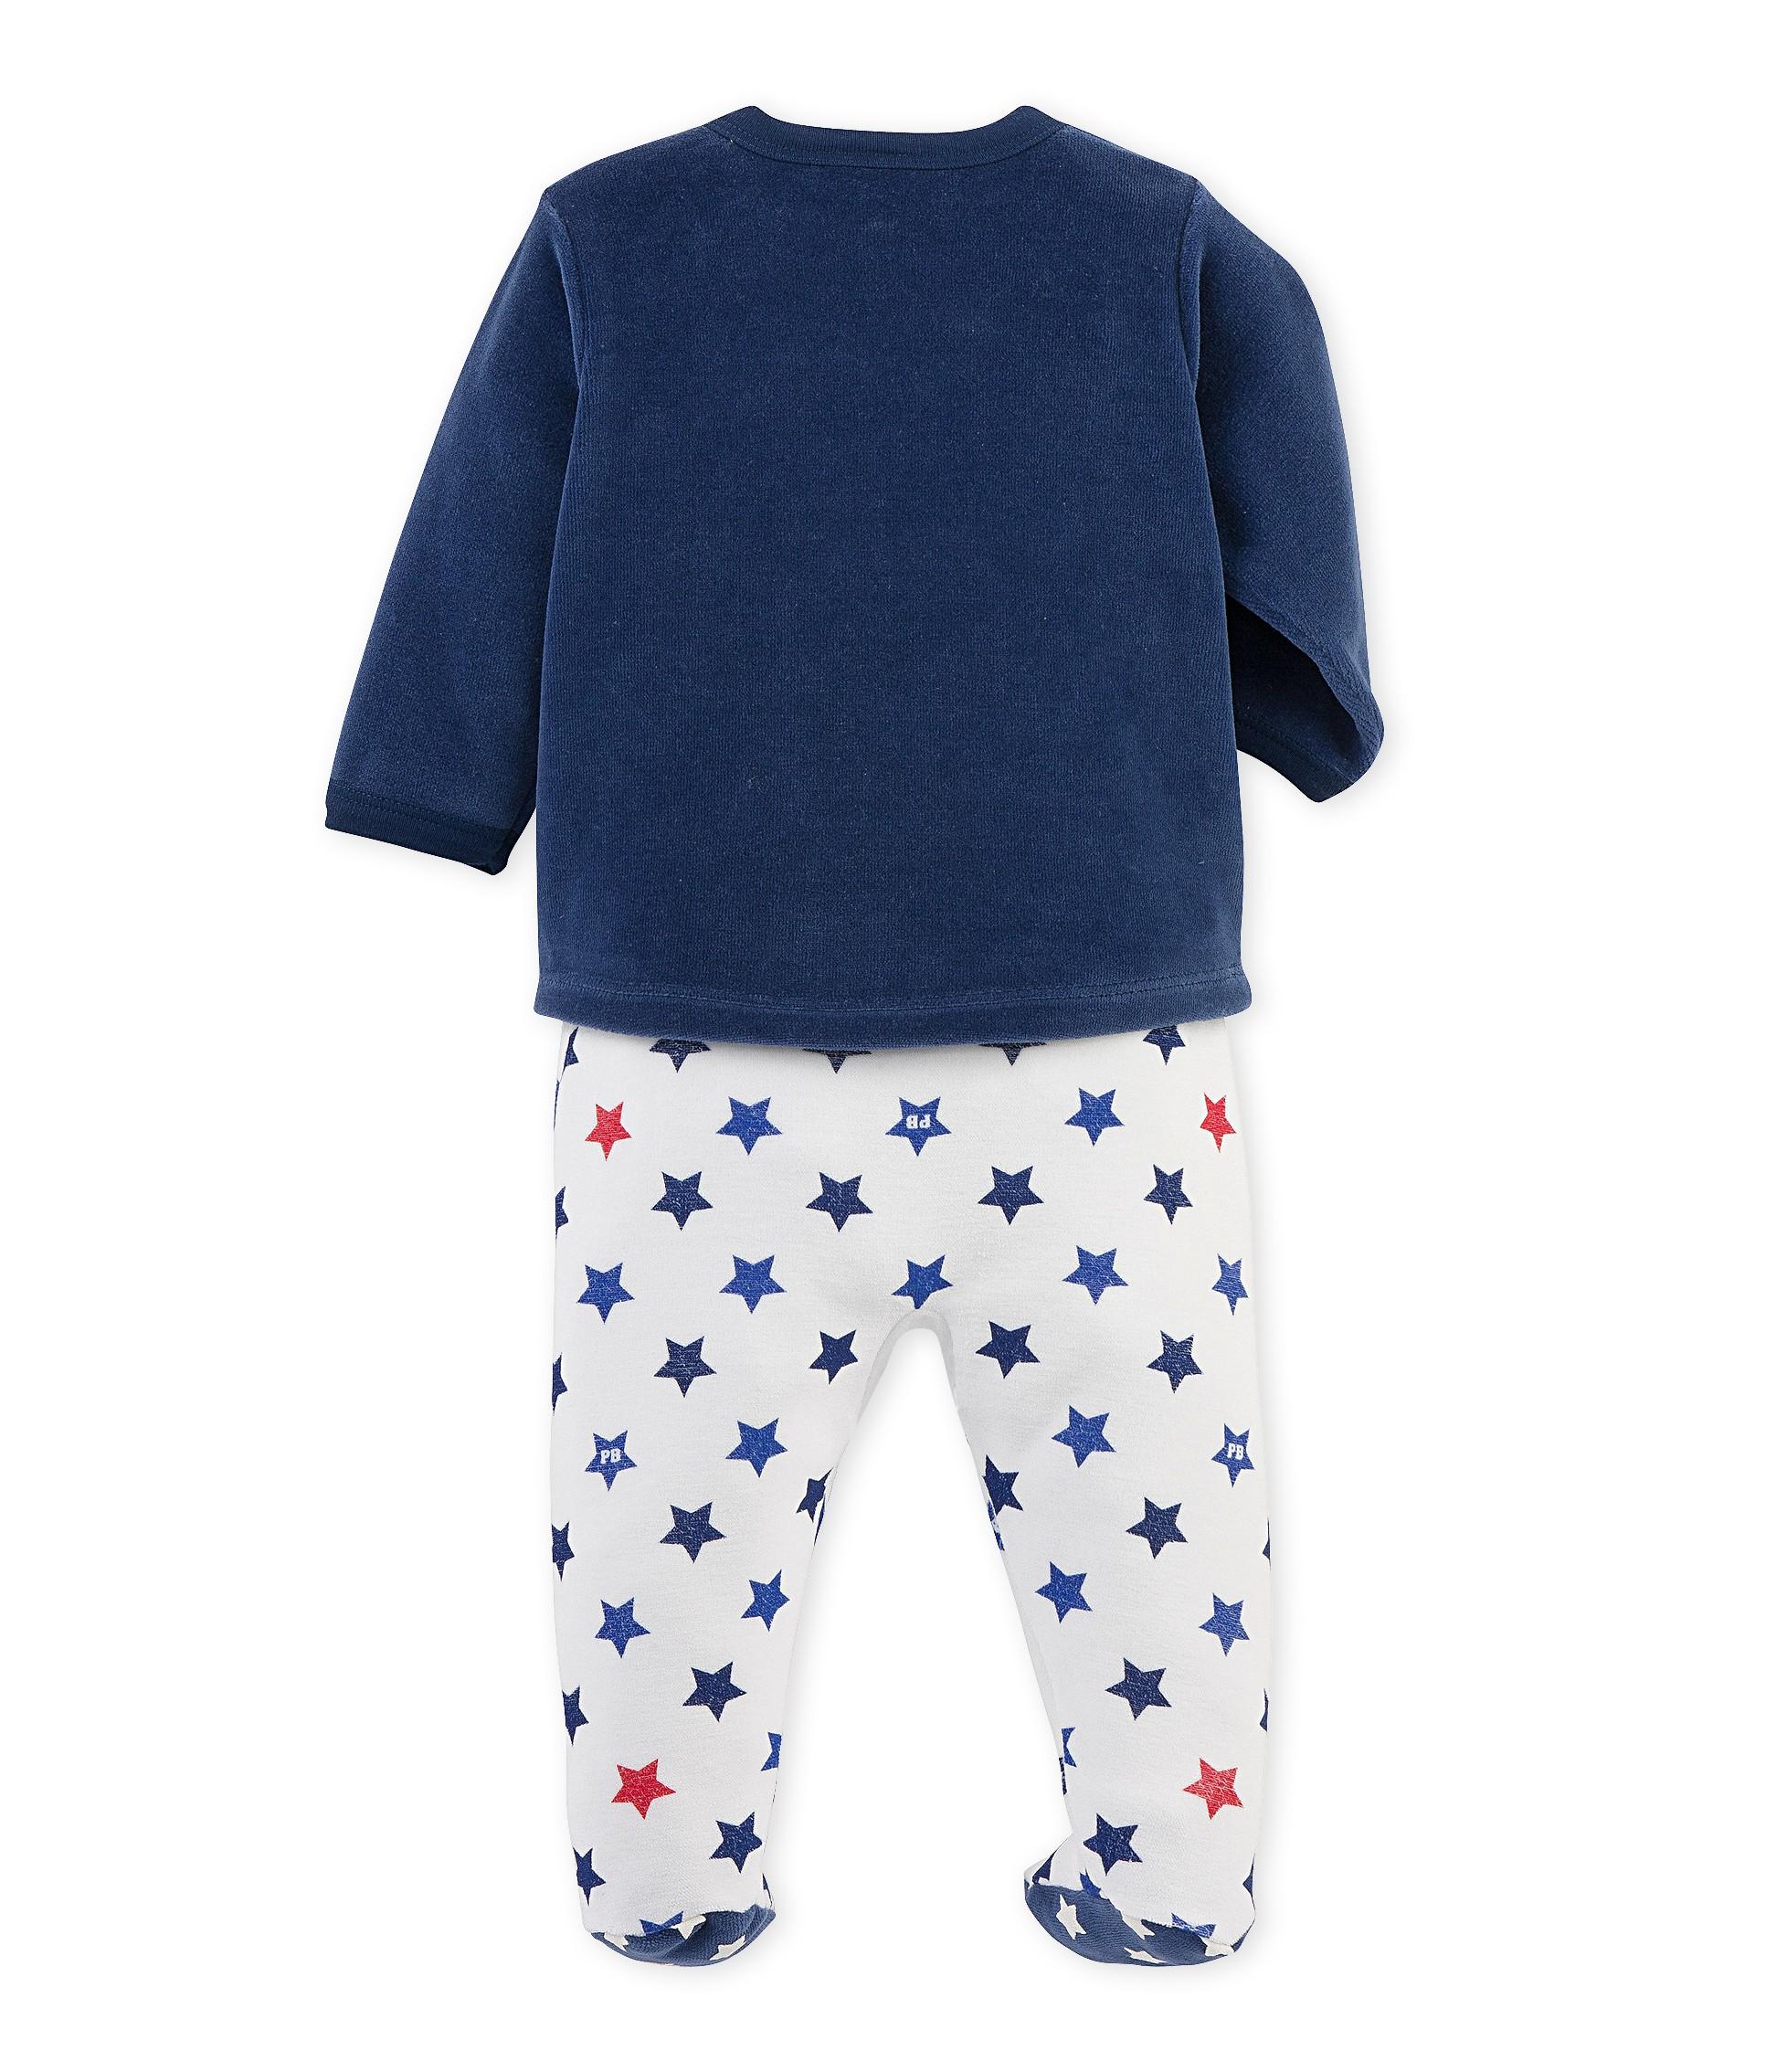 be84afb51955 Baby boy s pajamas with feet - petit-bateau.gr